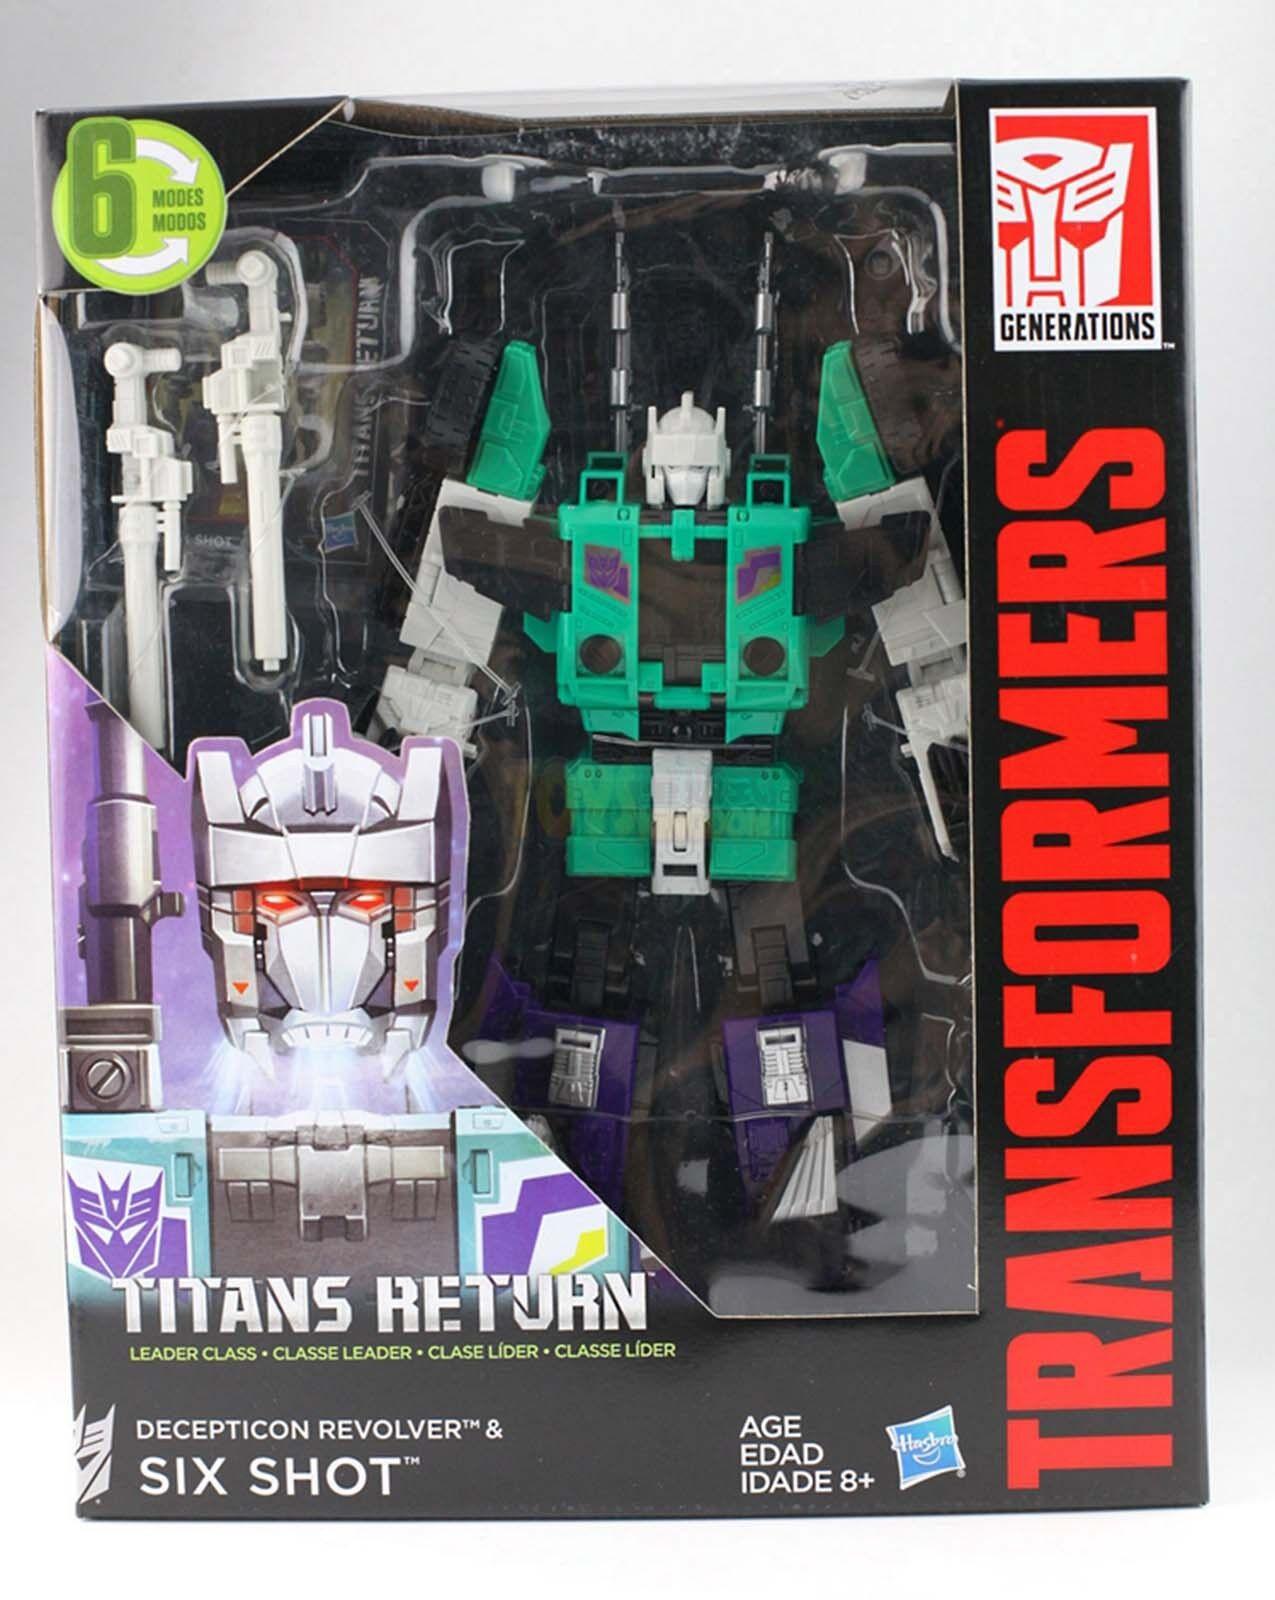 Transformers Generations Titans Return Leader Class SIXSHOT Six Shot Gift Kids N